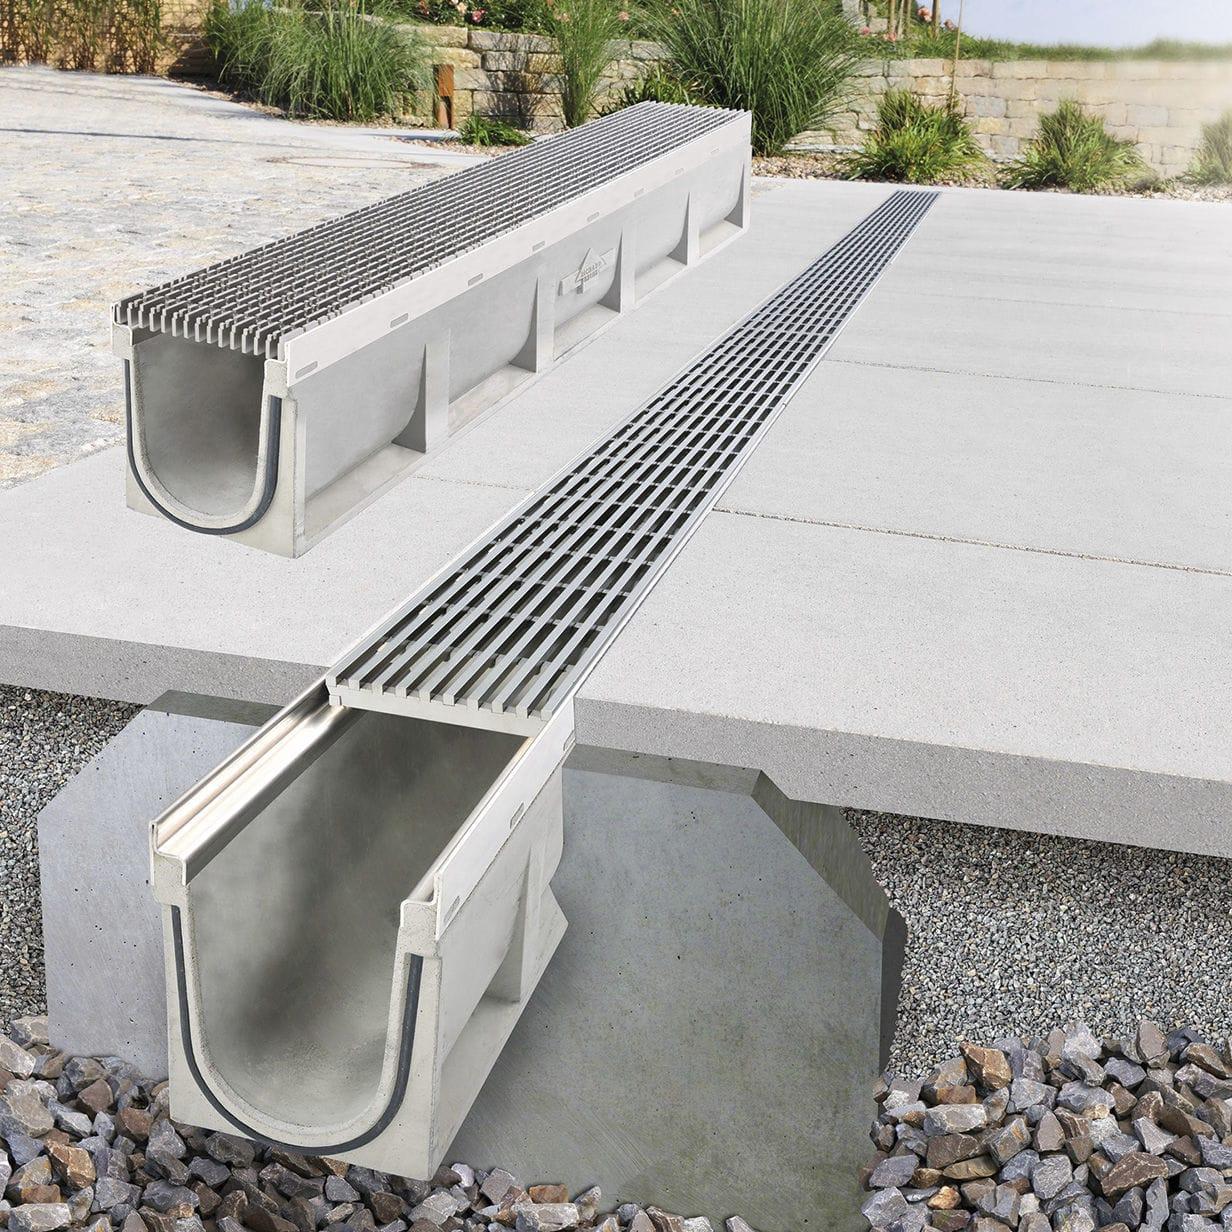 Verkehrs Entwasserungsrinne Beton Betonrinne Fortis Richard